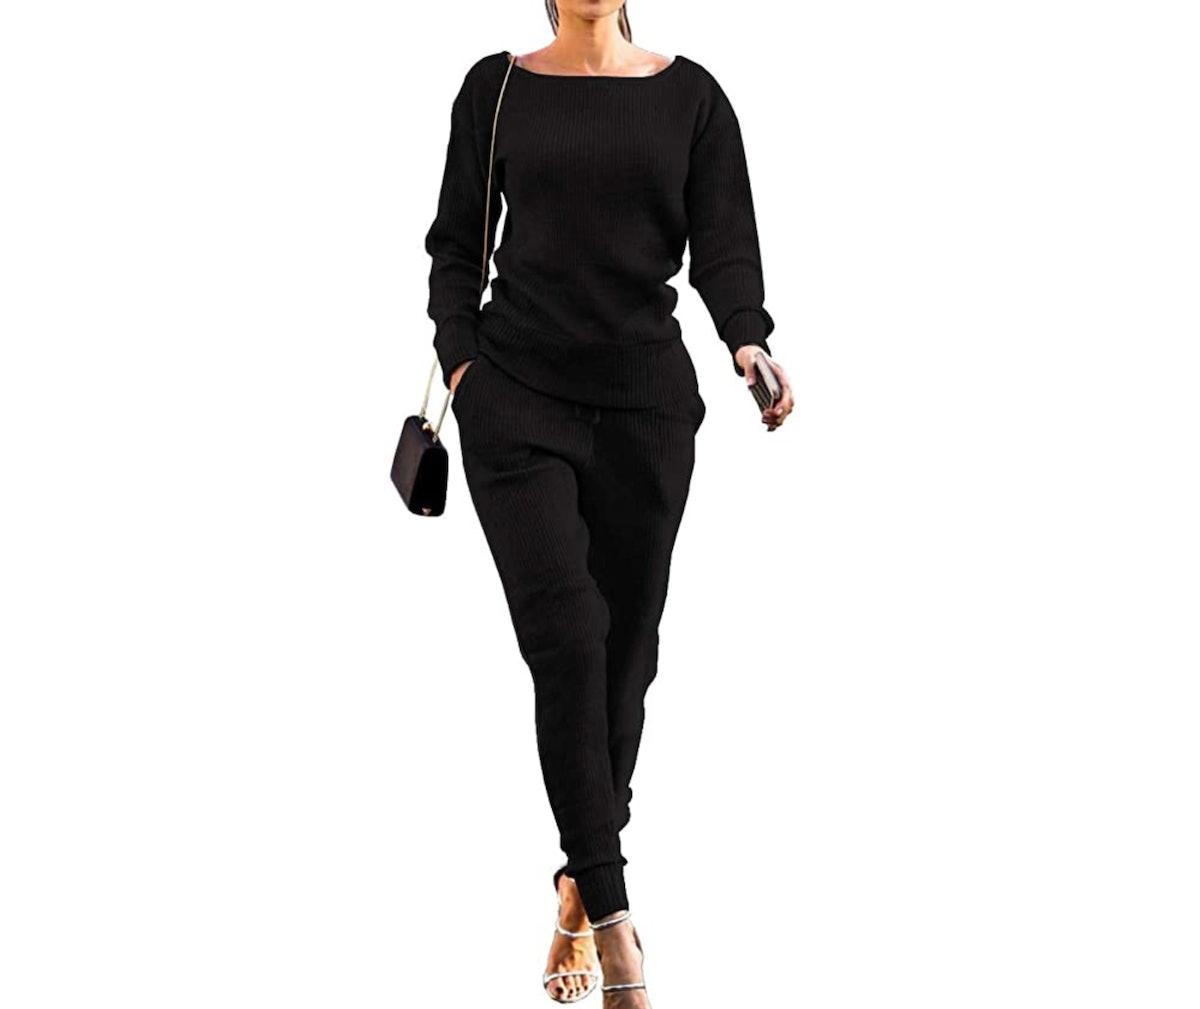 VNVNE Womens Fall Rib-Knit Pullover Sweater